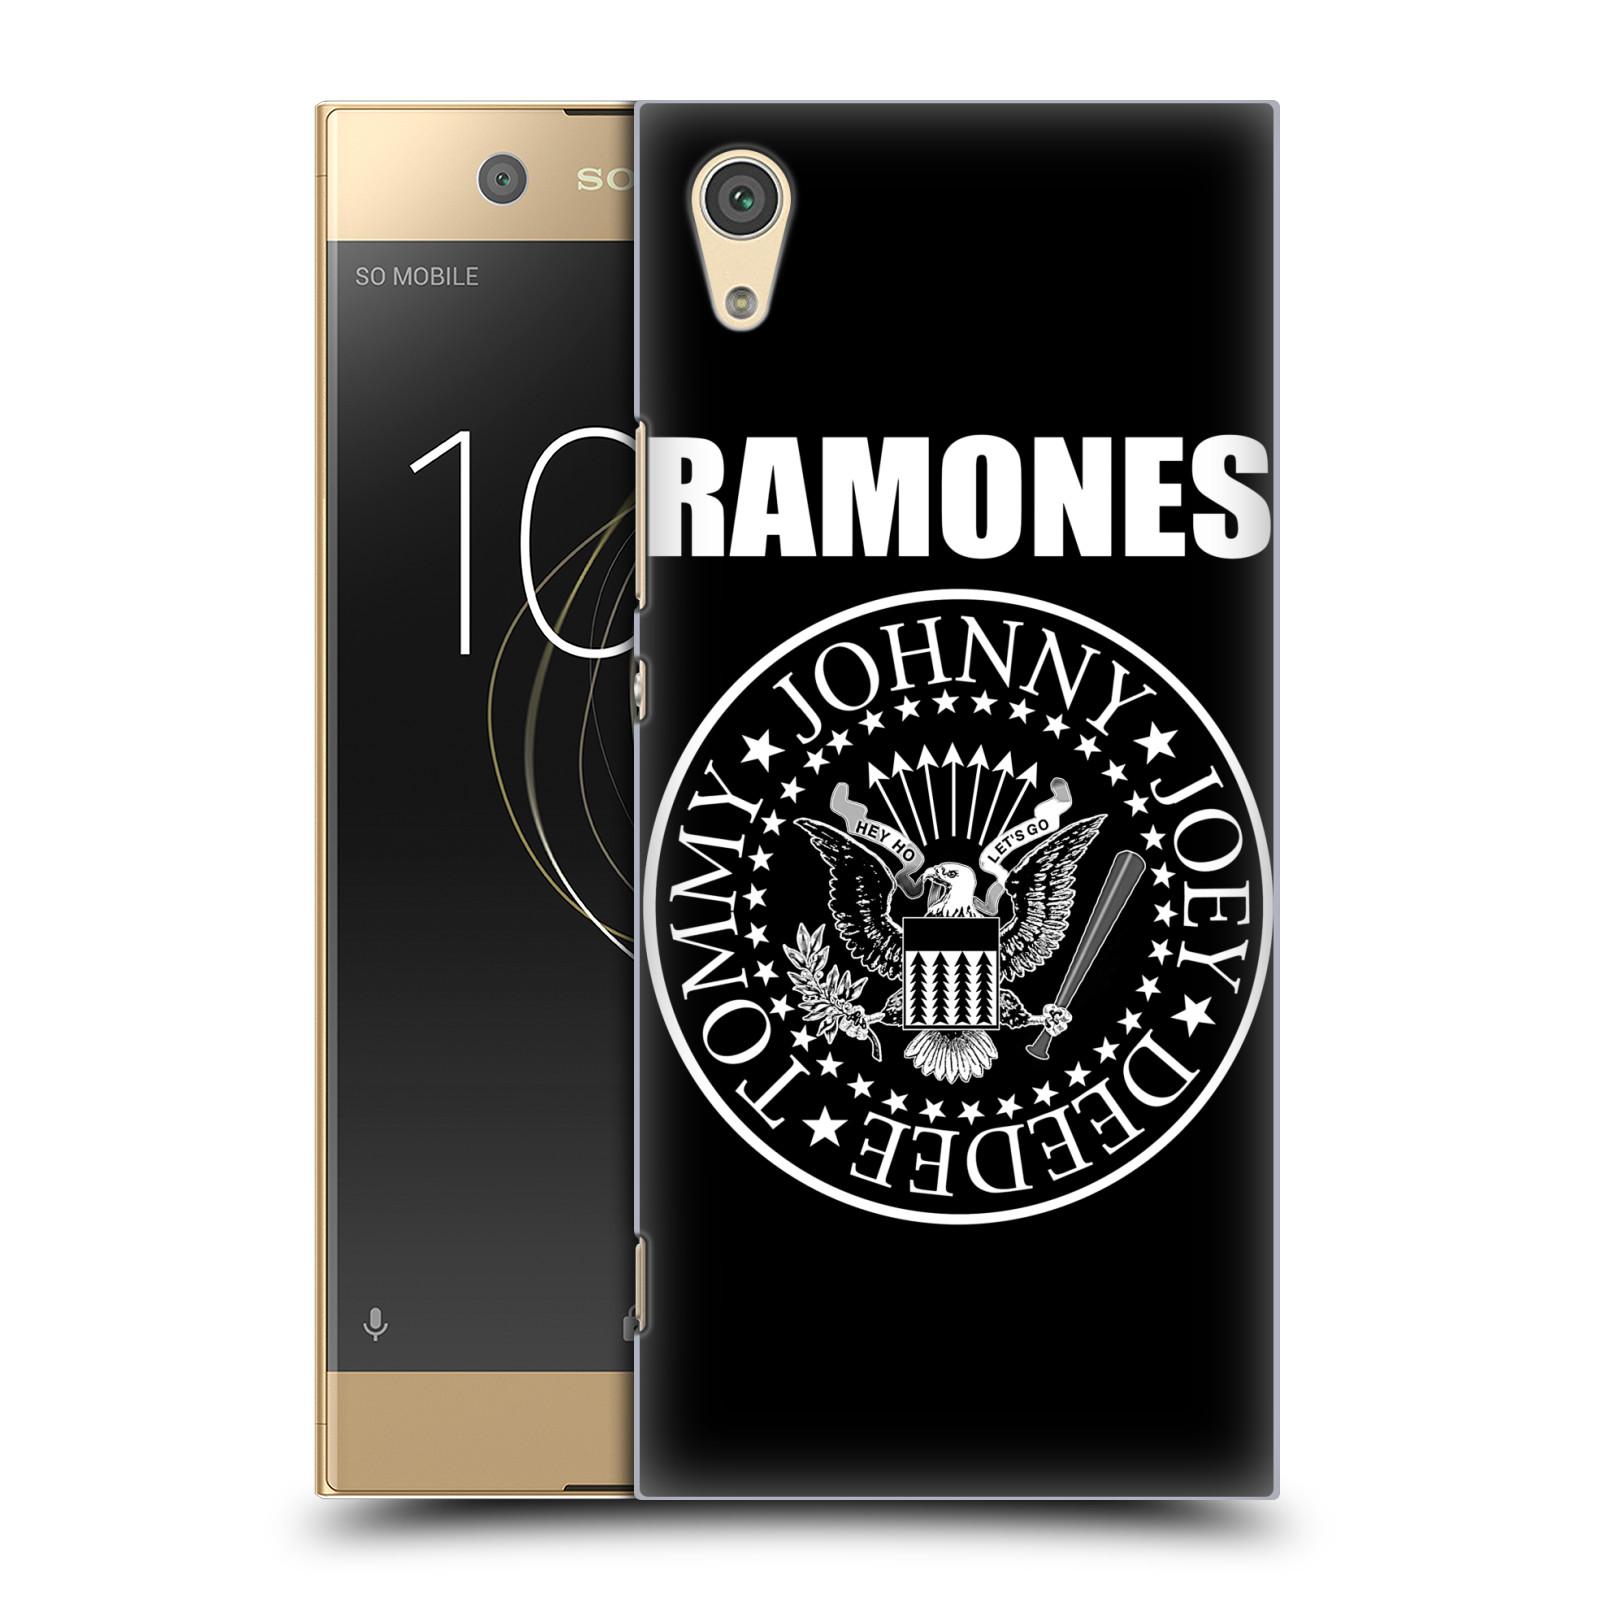 Plastové pouzdro na mobil Sony Xperia XA1 - Head Case - The Ramones - PRESIDENTIAL SEAL